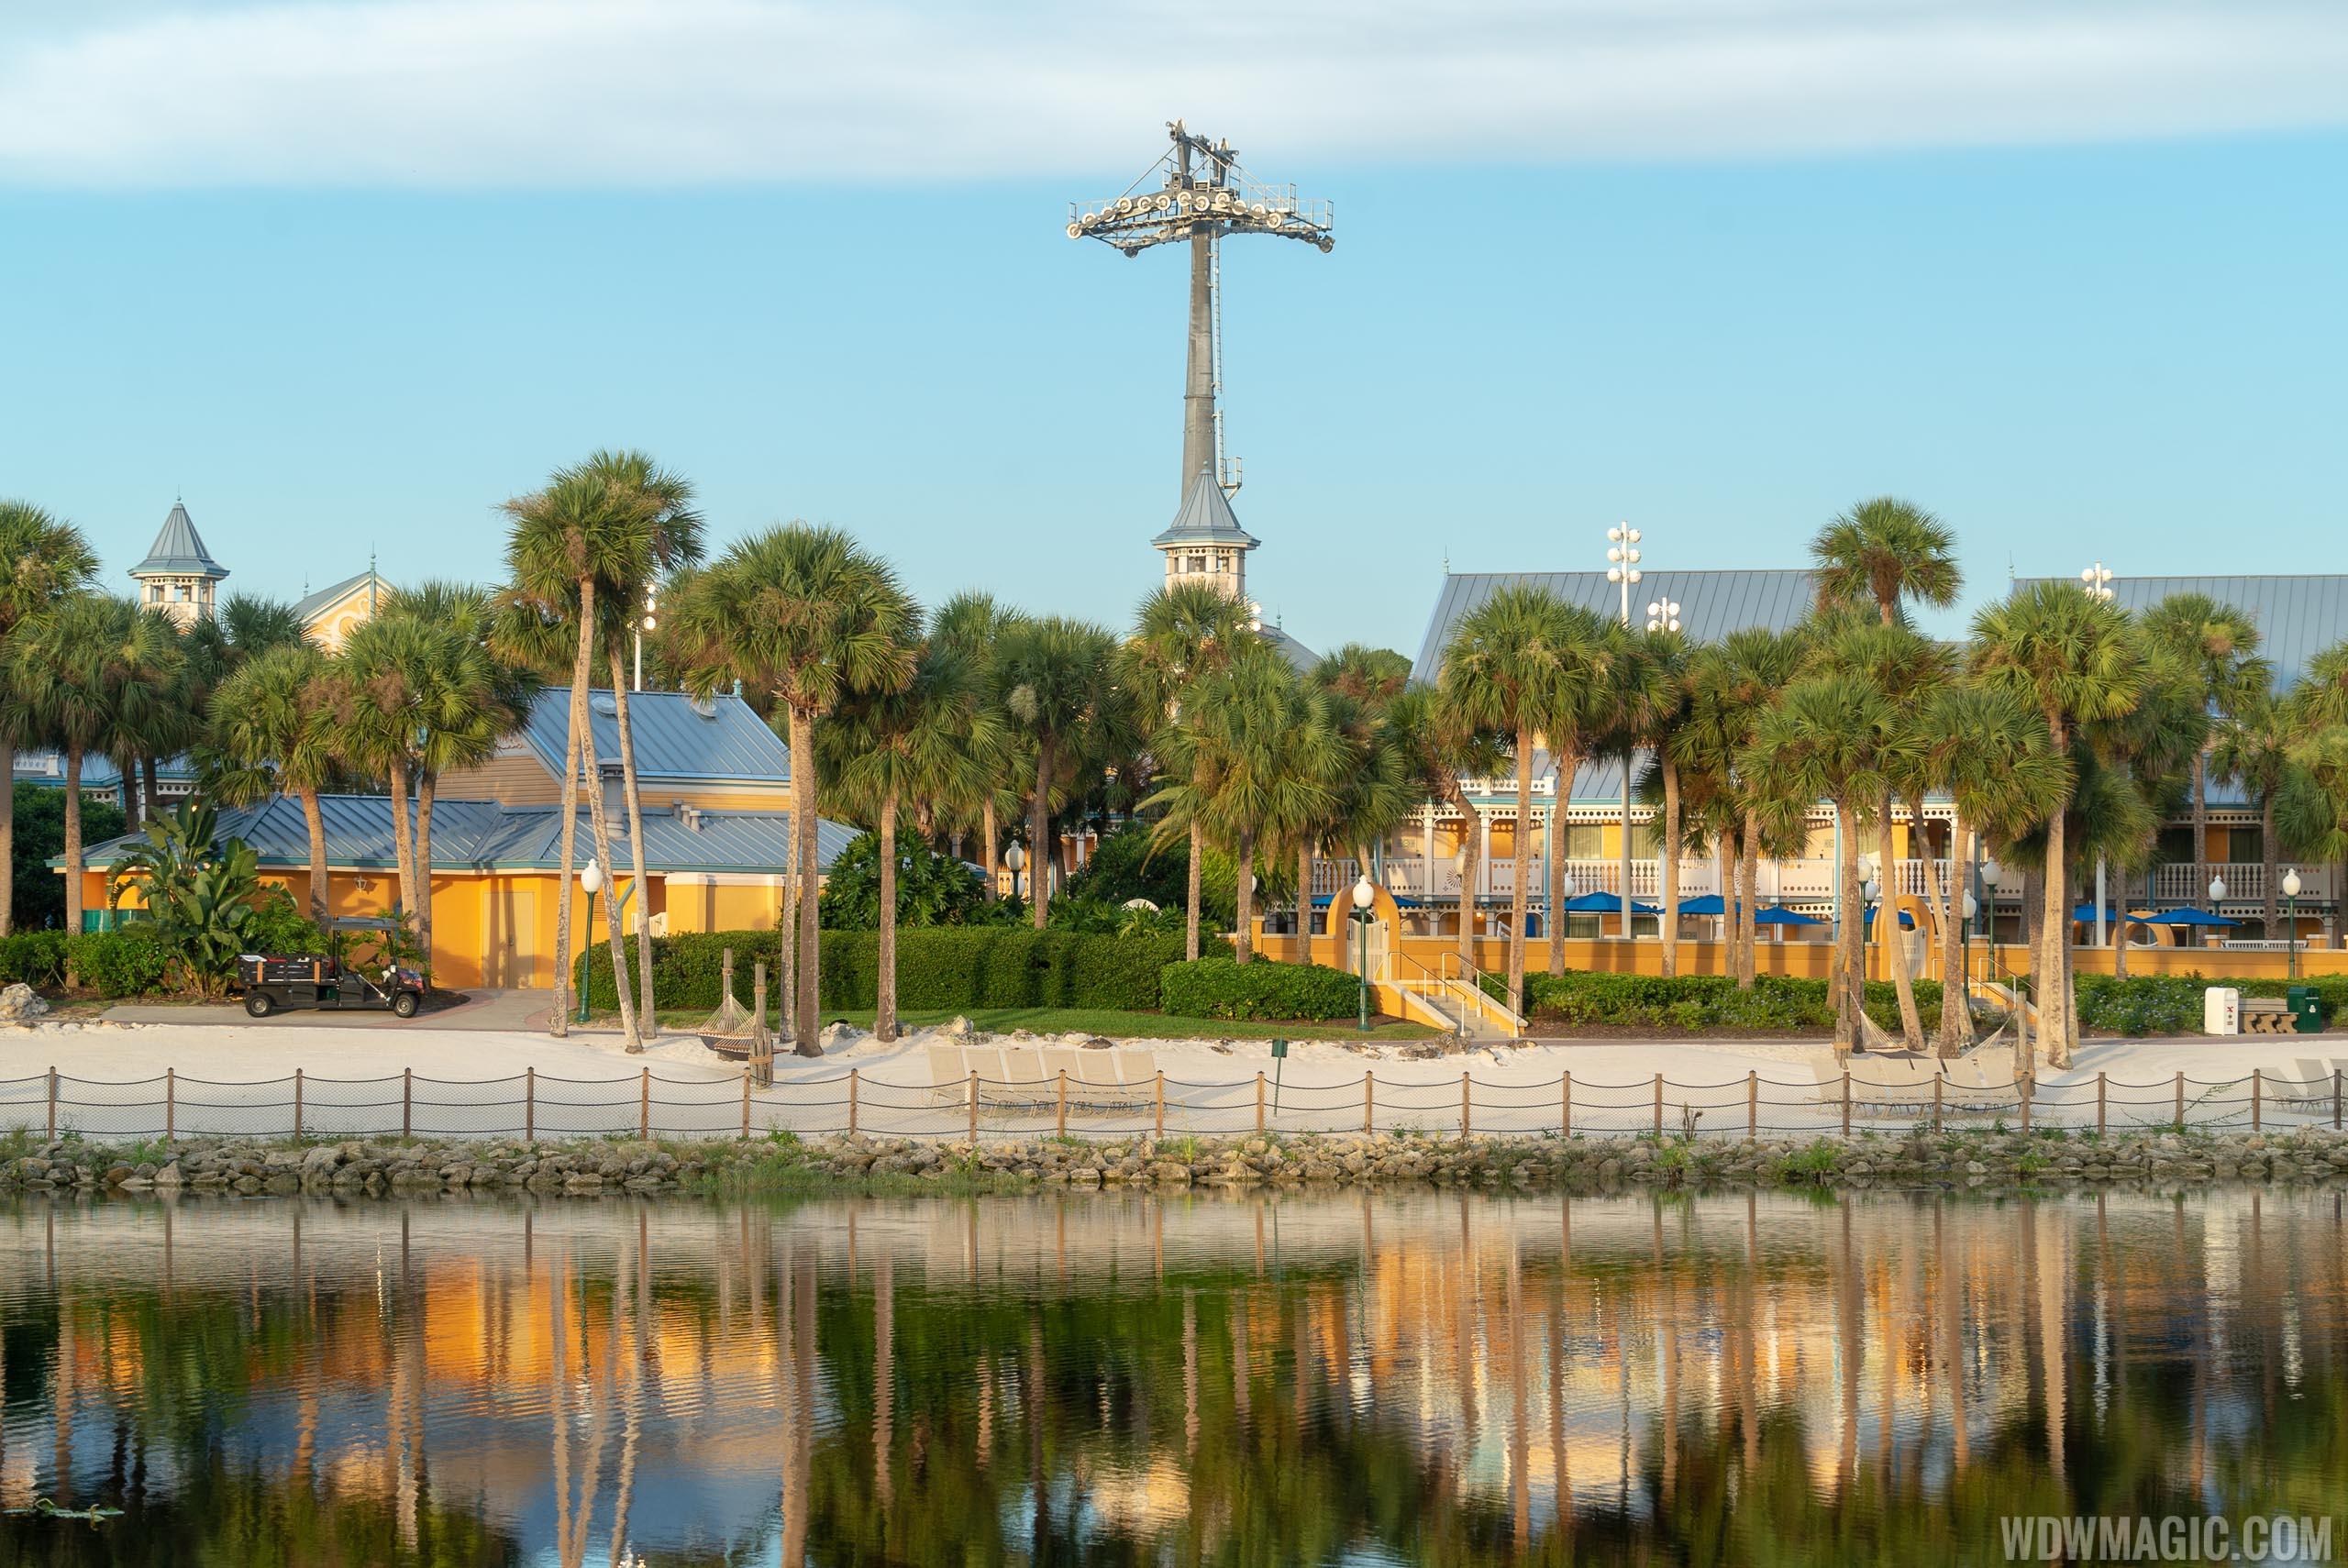 Disney Skyliner towers at Caribbean Beach Resort